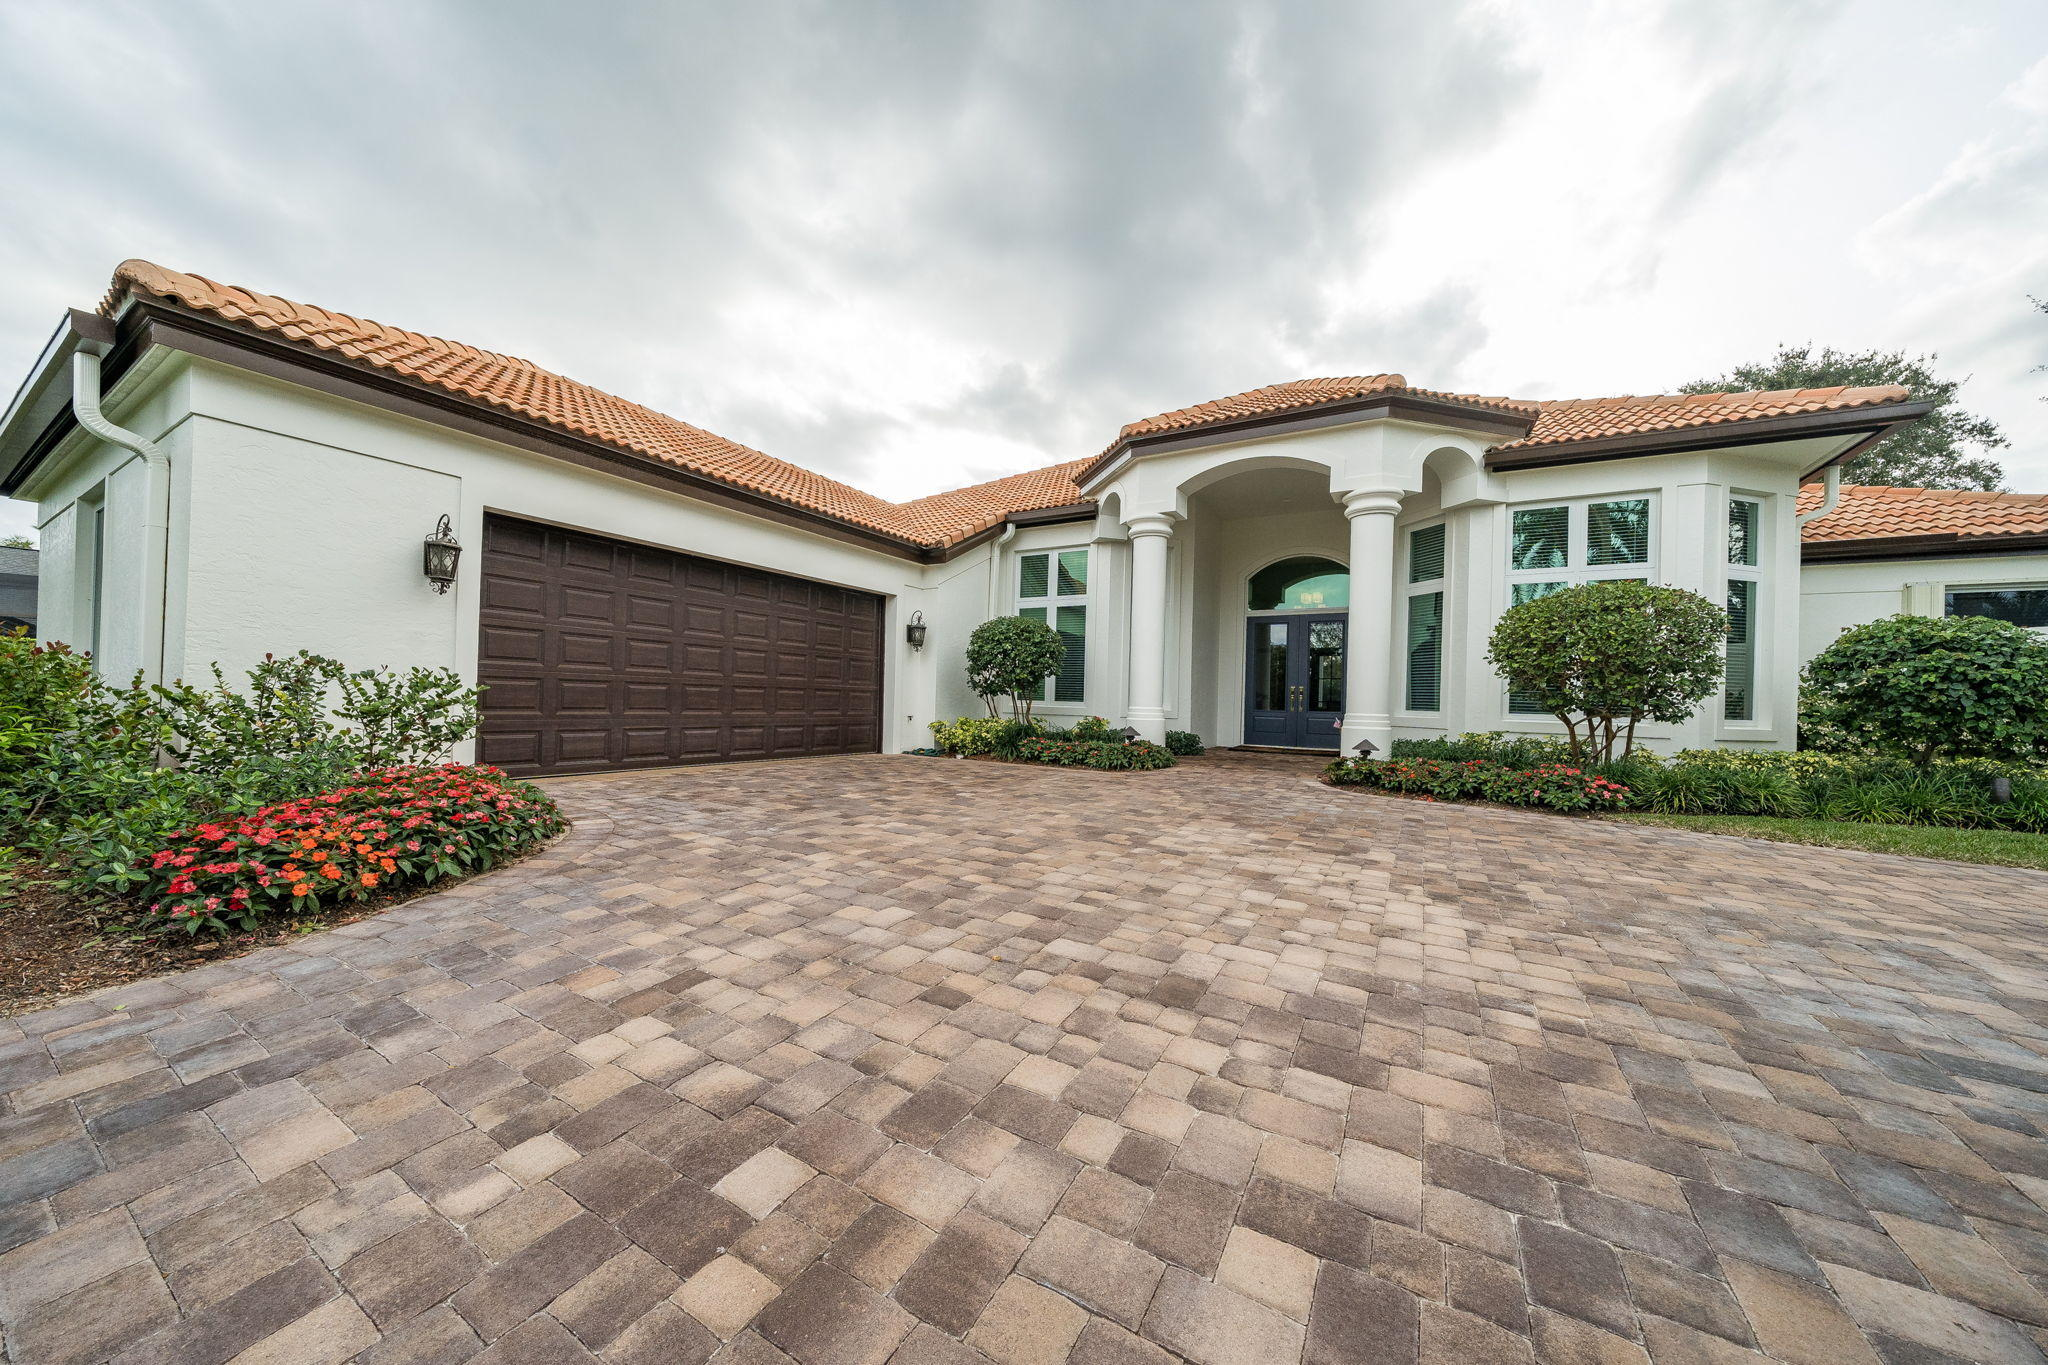 1 Loggerhead Lane, Tequesta, Florida 33469, 3 Bedrooms Bedrooms, ,4.1 BathroomsBathrooms,A,Single family,Loggerhead,RX-10598004